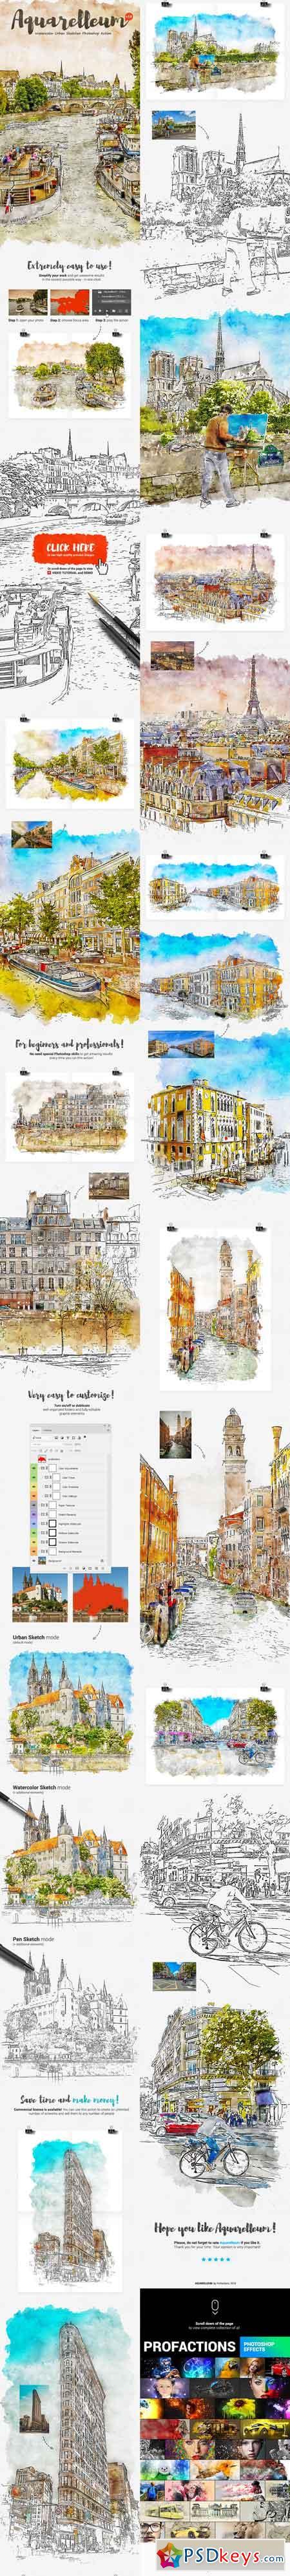 Aquarelleum - Urban Sketcher Photoshop Action 21938349